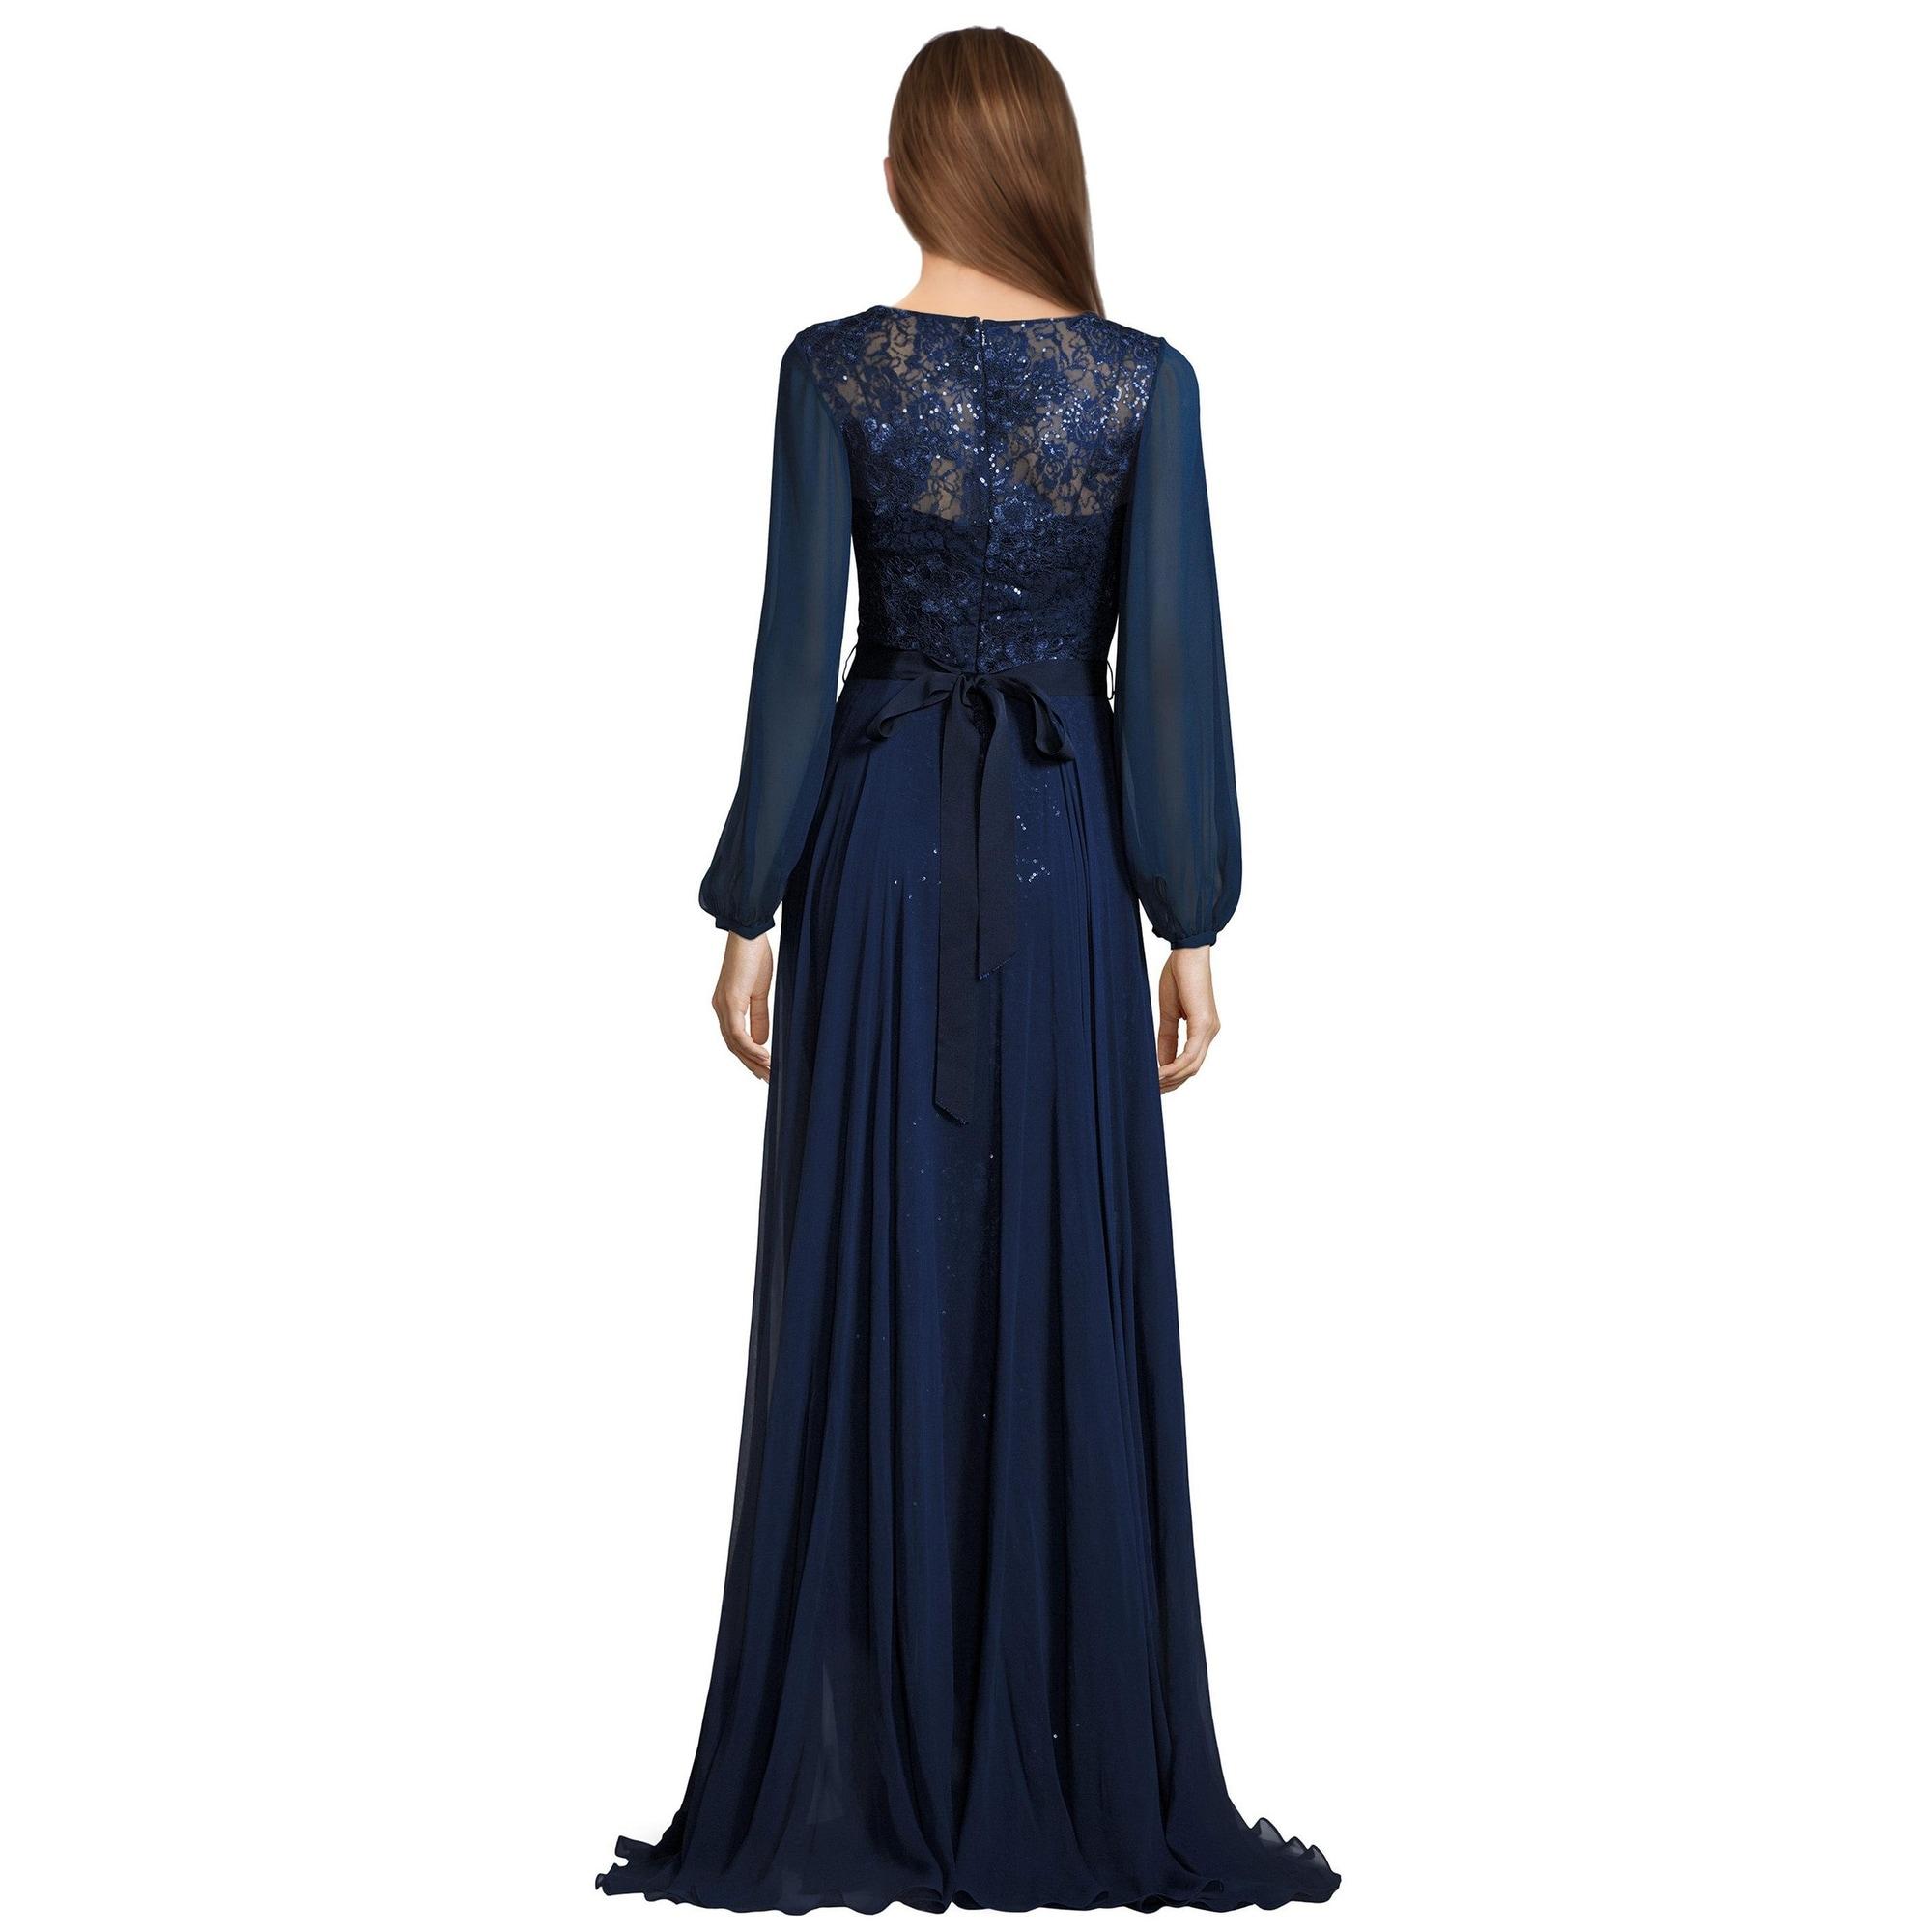 Teri Jon Lace Chiffon Beaded Long Sleeve Evening Gown Dress Free